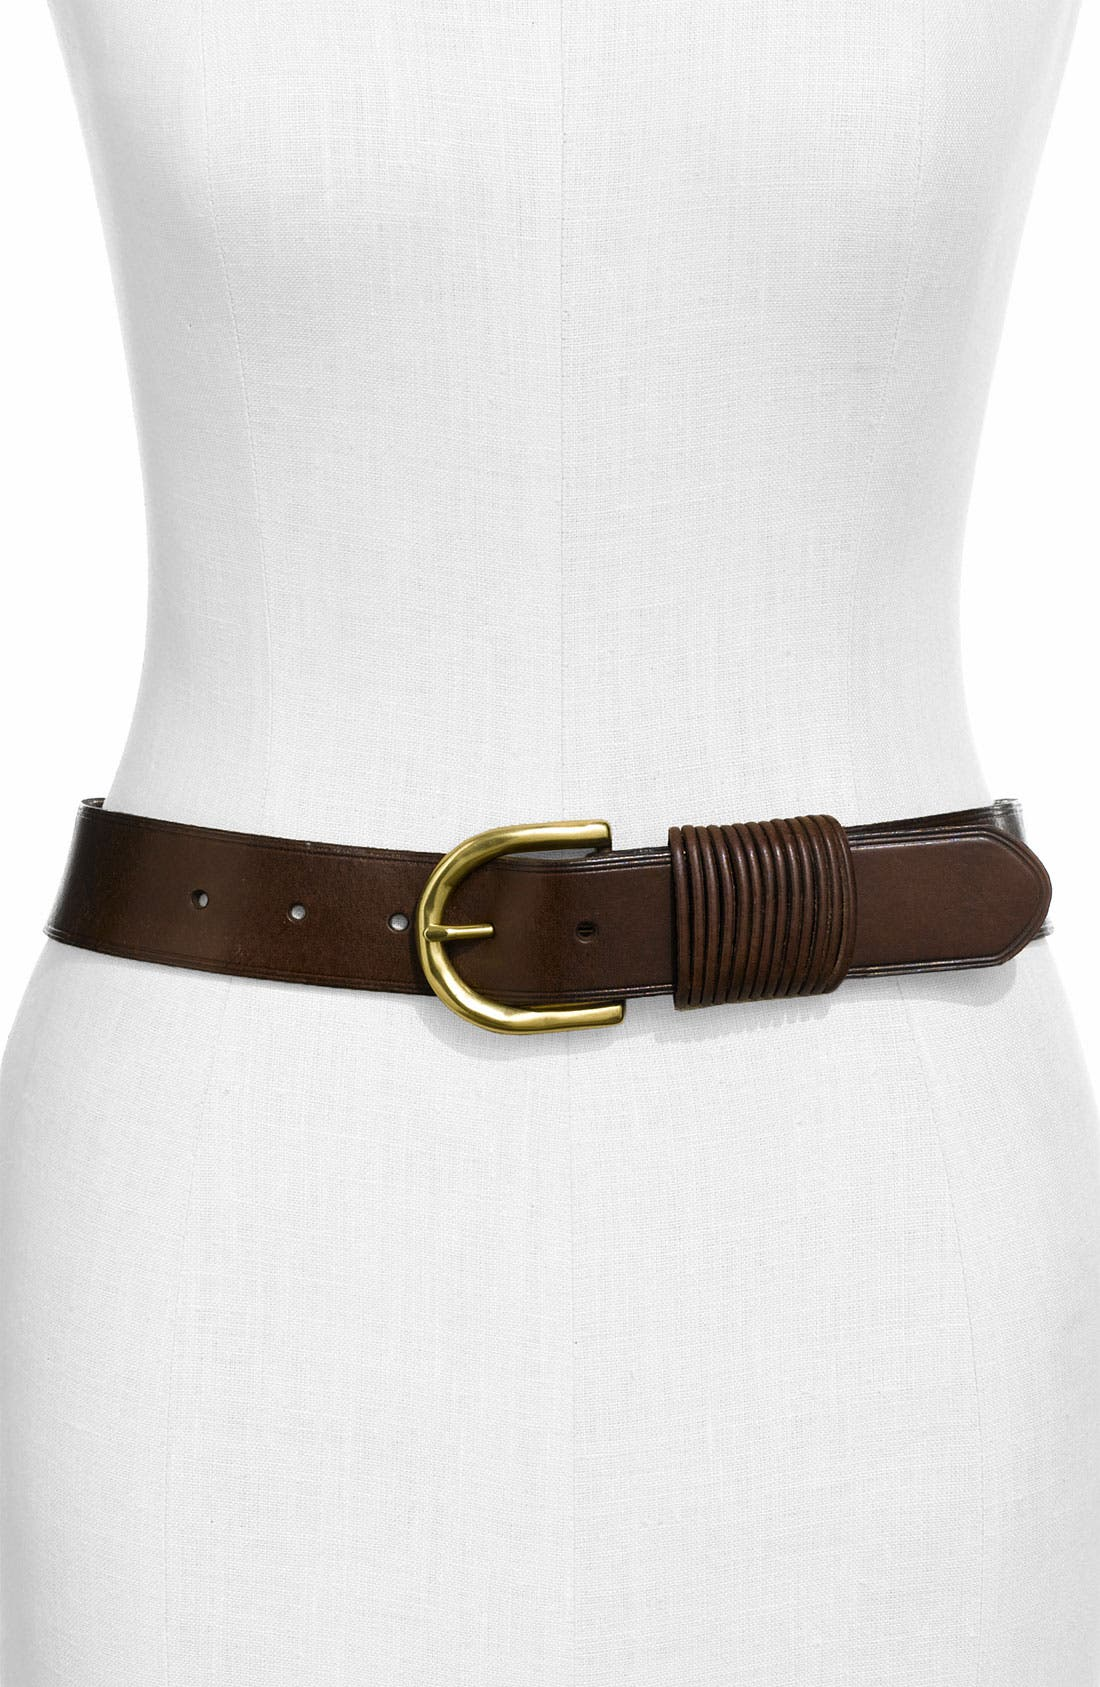 Alternate Image 1 Selected - Lauren Ralph Lauren Vegetable Tanned Leather Belt